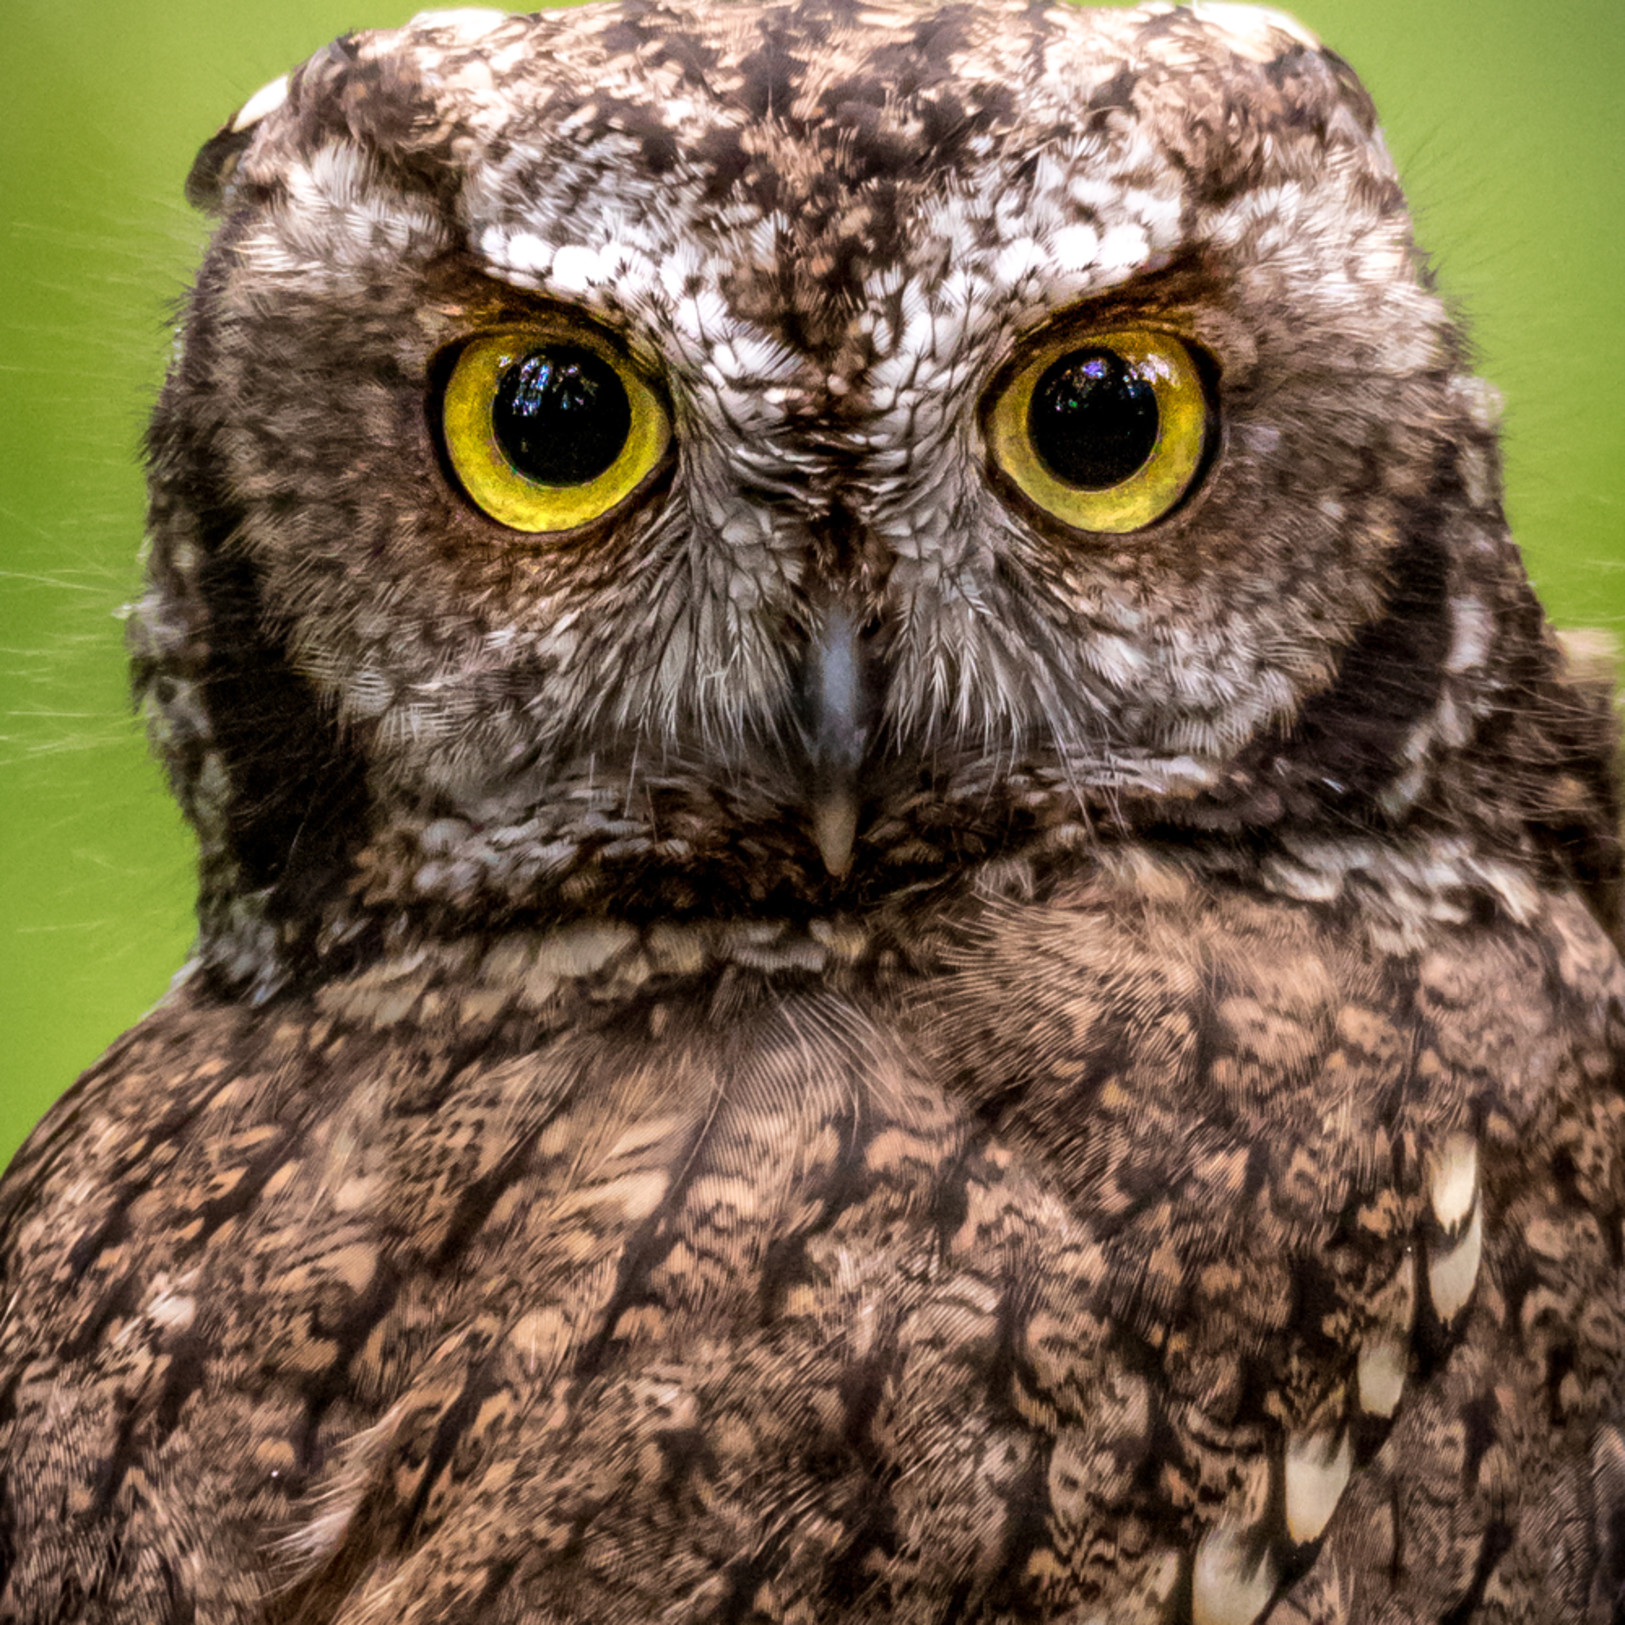 Asf horned owl 1 0006 vxyu45